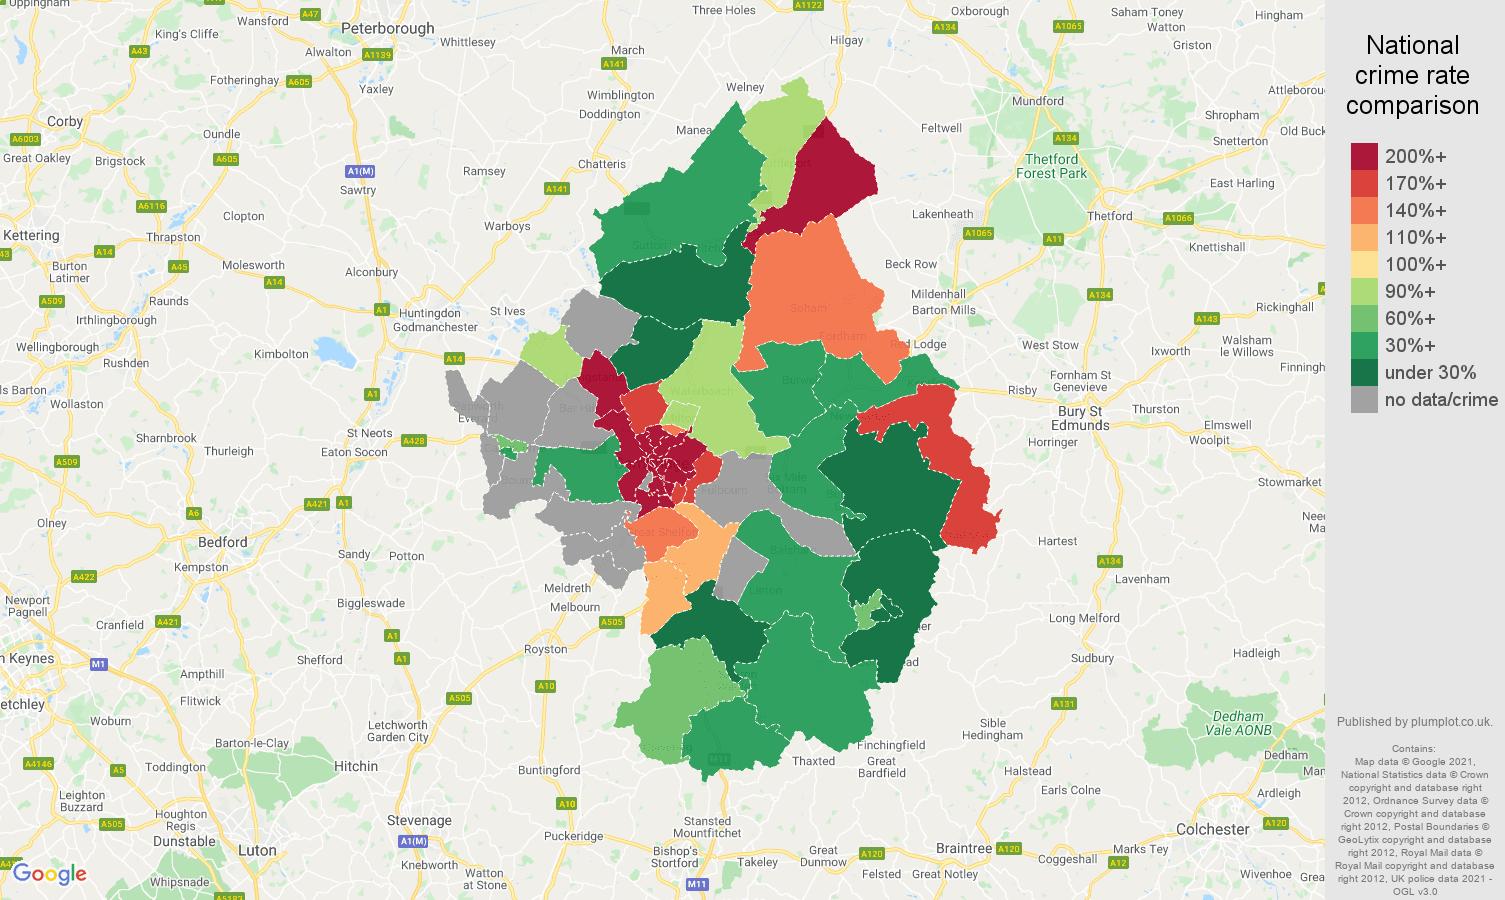 Cambridge bicycle theft crime rate comparison map